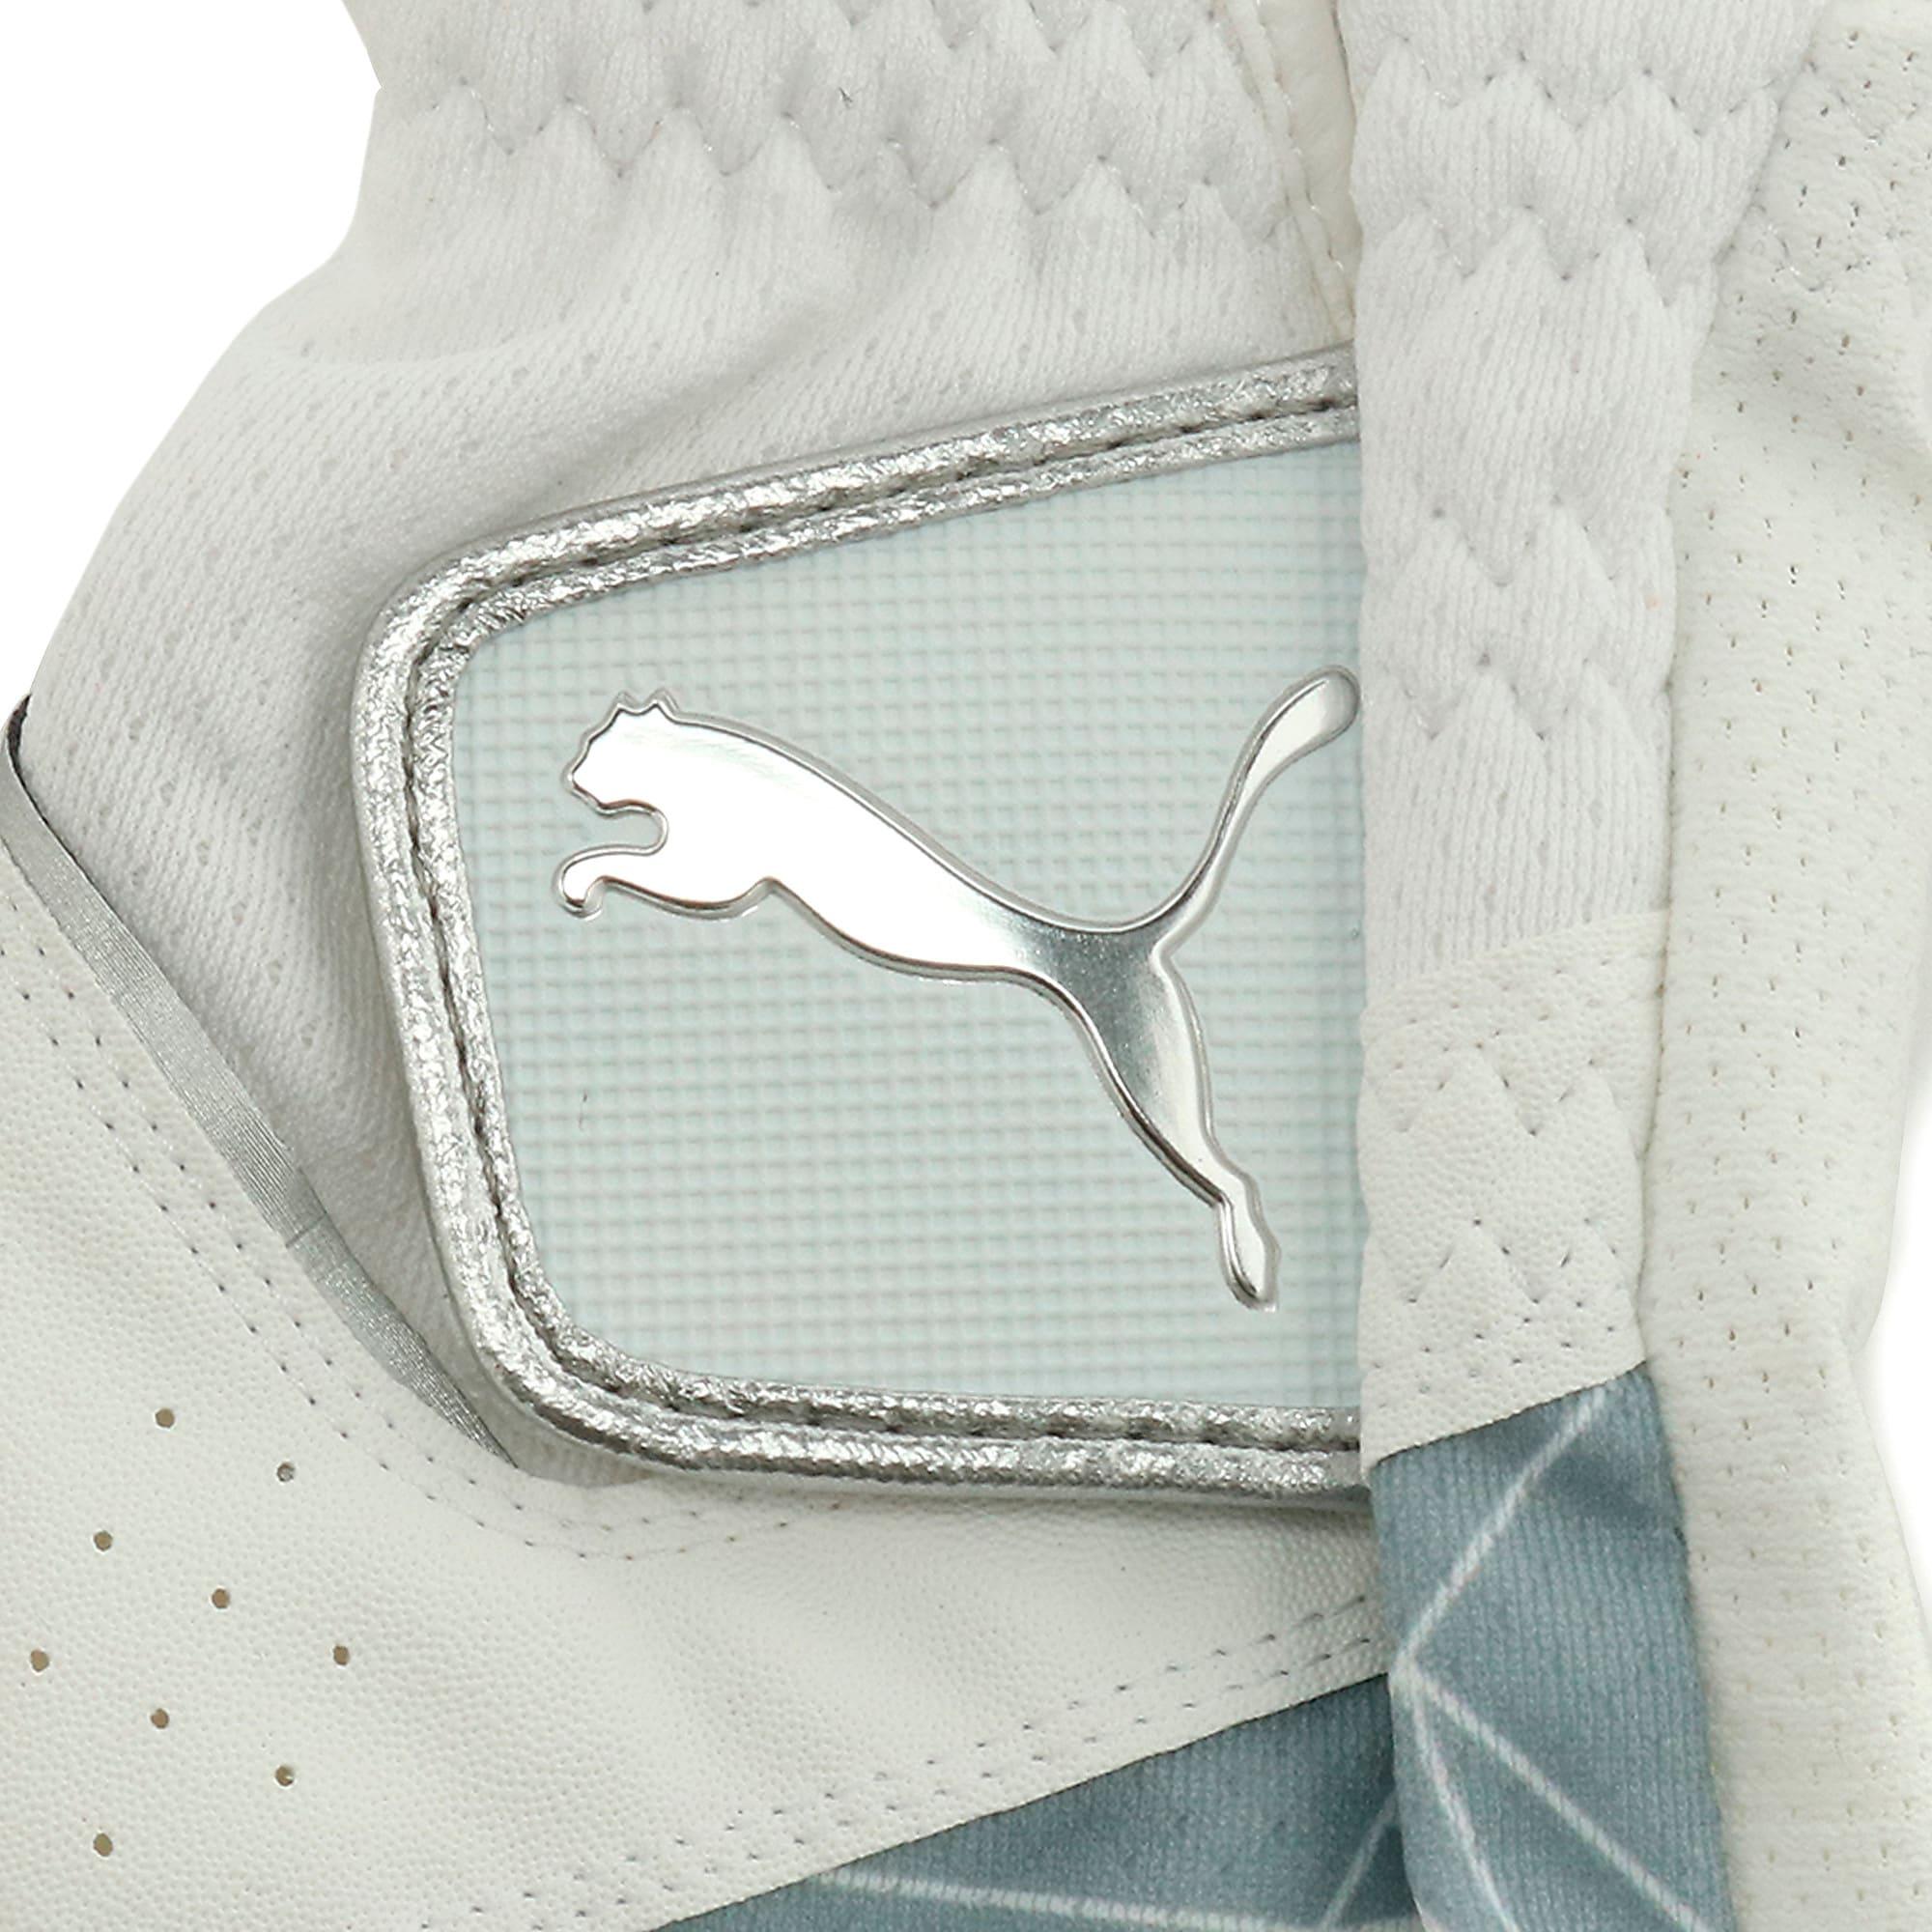 Thumbnail 3 of ゴルフ 3D サマー グローブ, White / Silver, medium-JPN